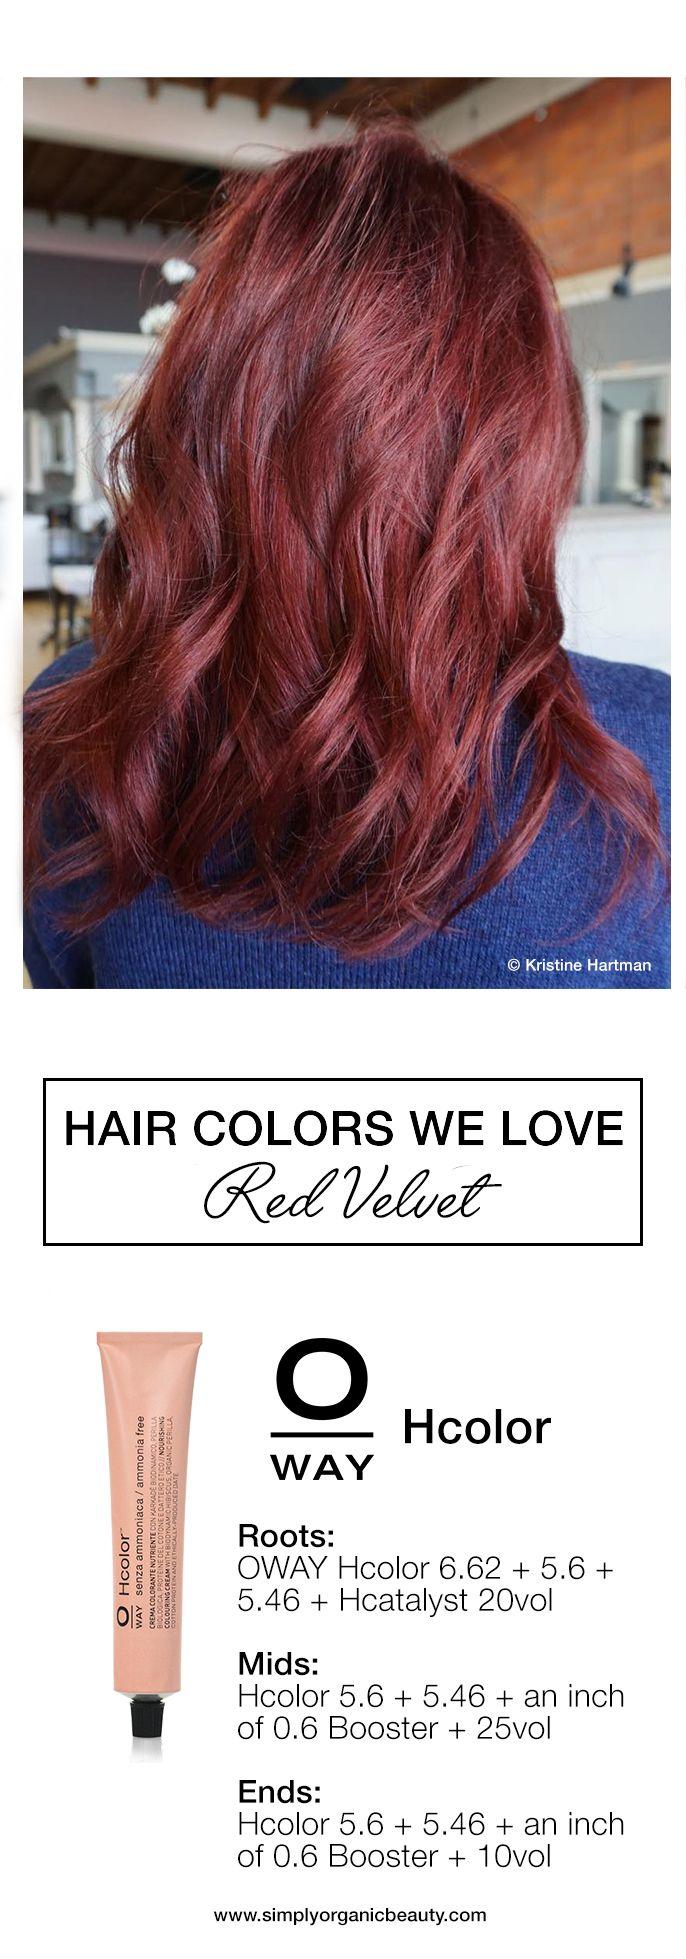 Best 25+ Hair color formulas ideas on Pinterest | Red ...